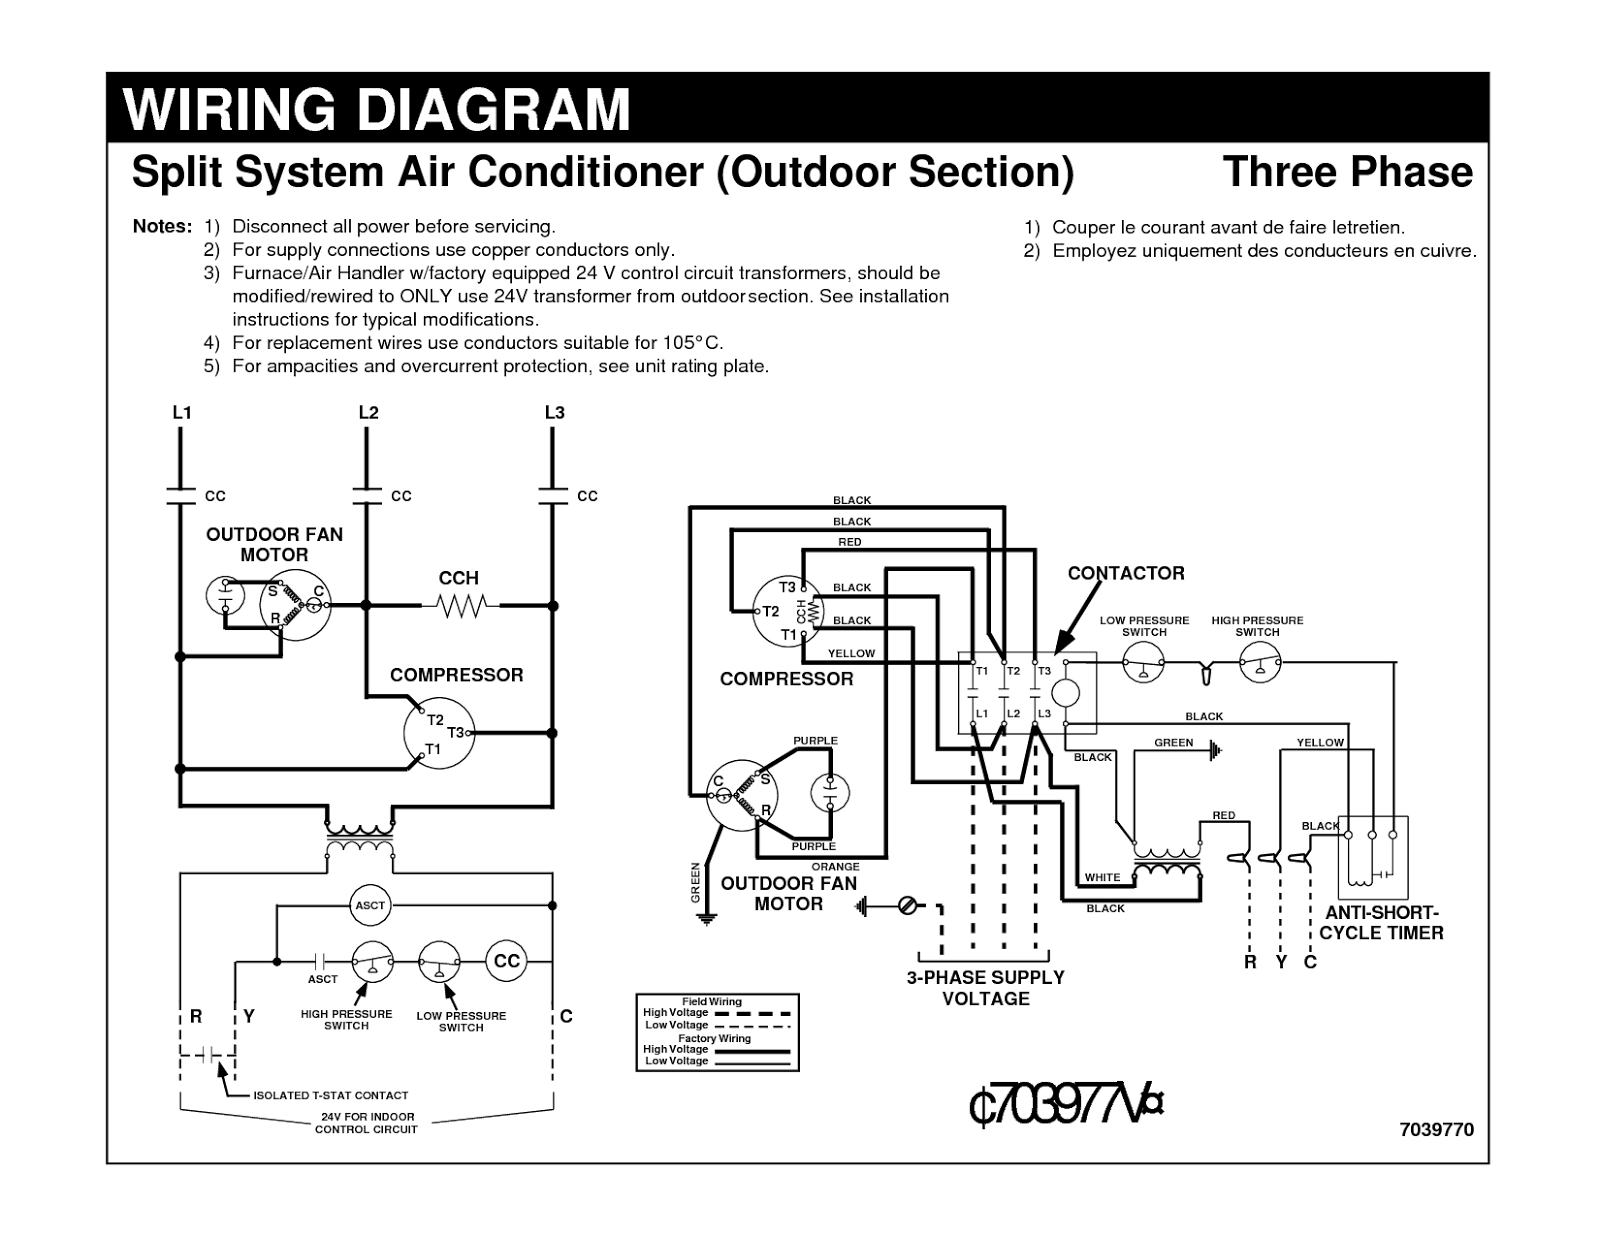 Ac Wiring | Wiring Diagram - Ac Wiring Diagram